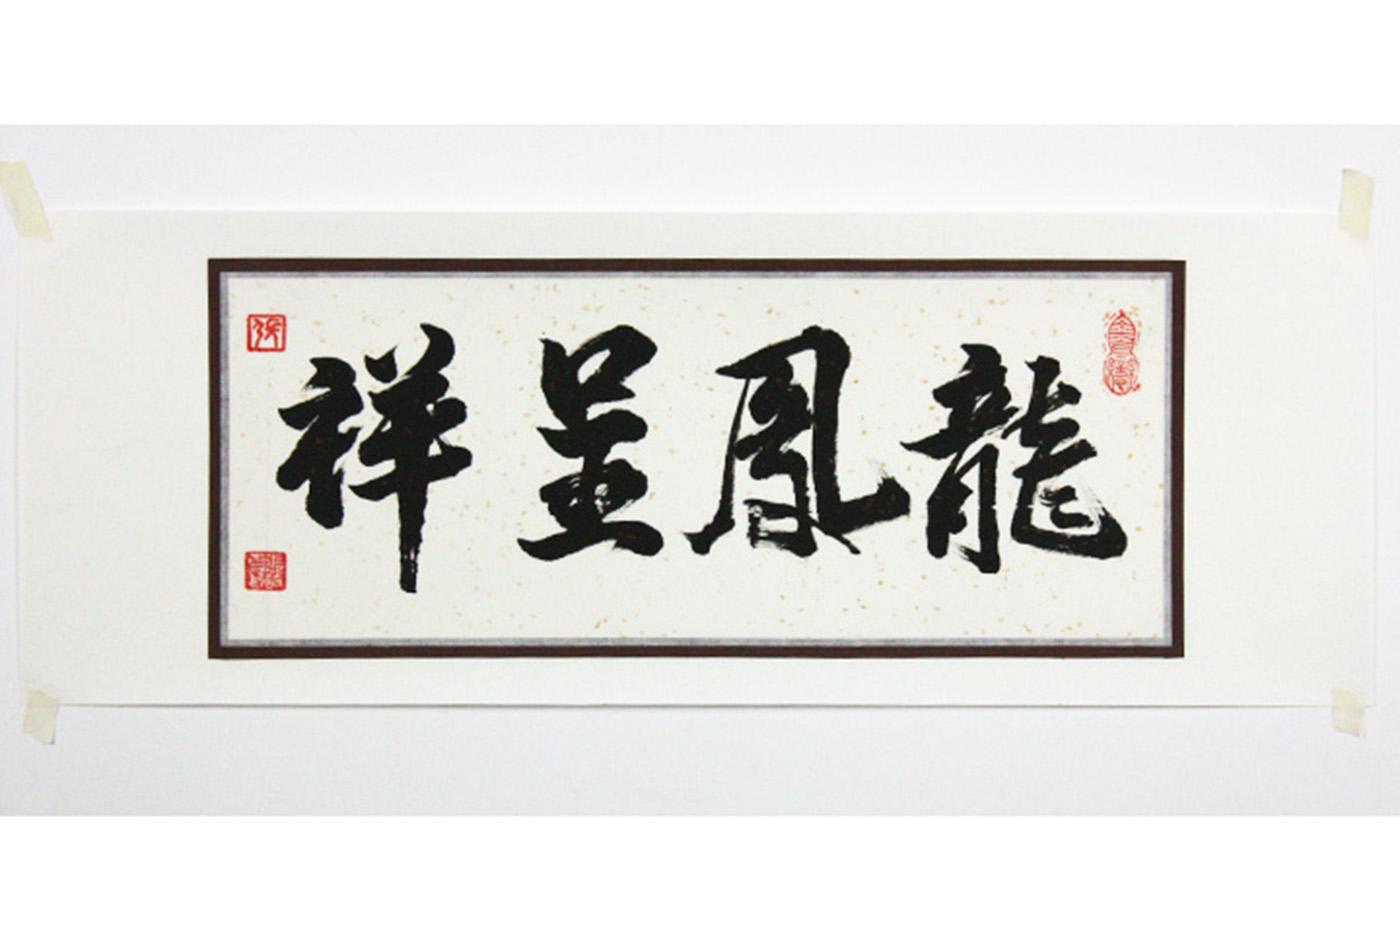 Calligraphie dragon et phénix